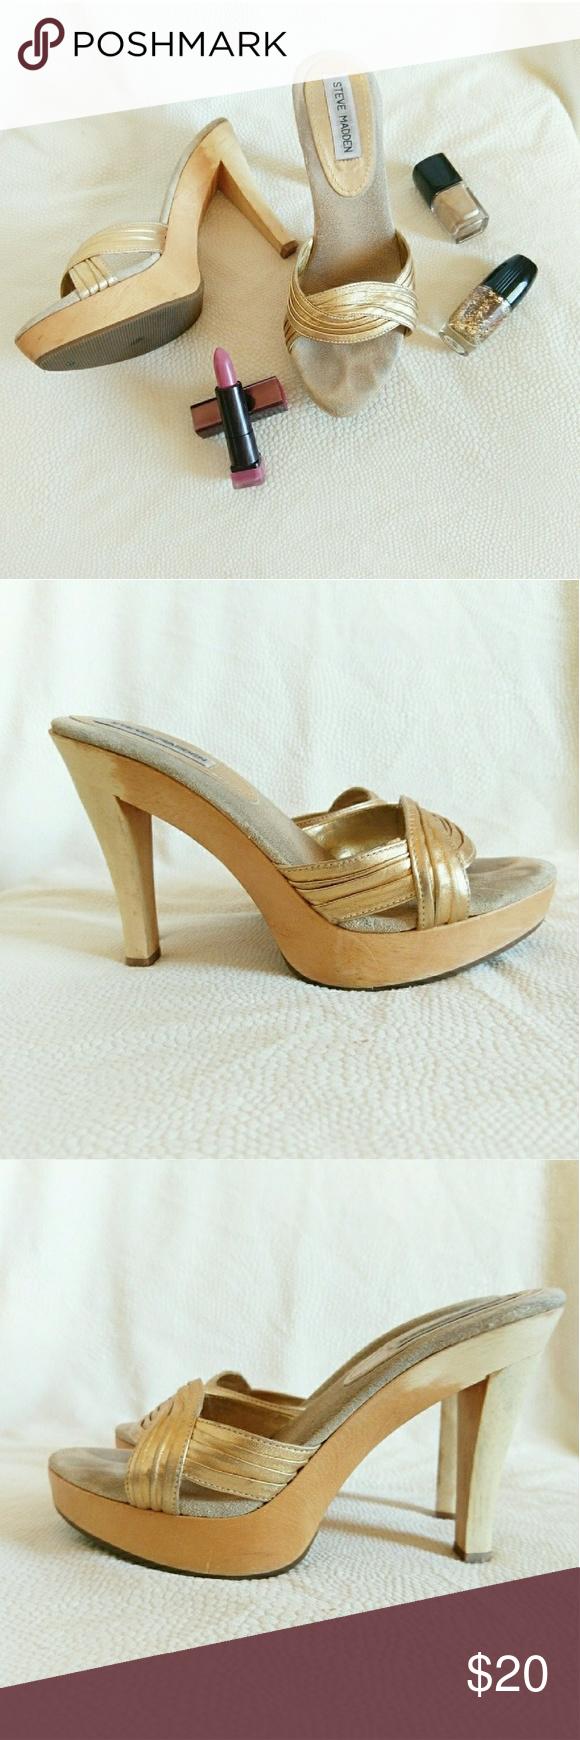 c1d8ebdaa26 Steve Madden wooden heel sandals *Price Negotiable *No Offers Cute ...